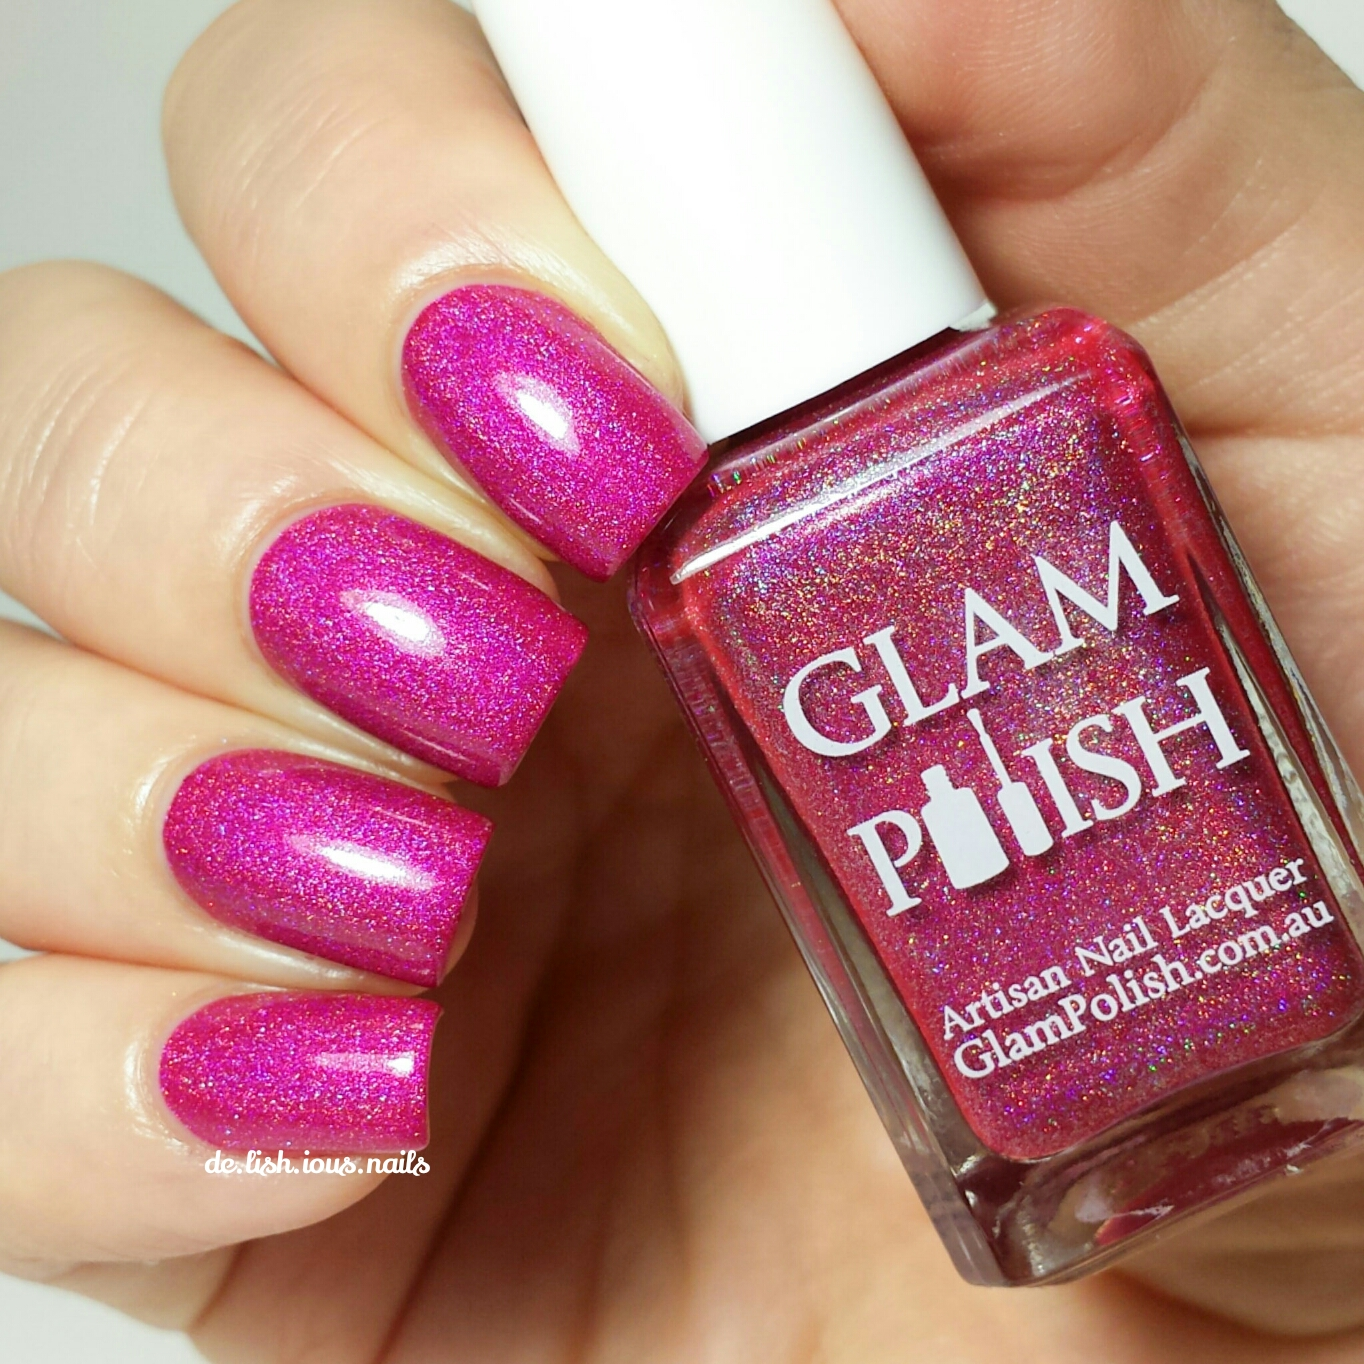 glam-polish-starlet-or-streetwalker-1.jpg.jpeg